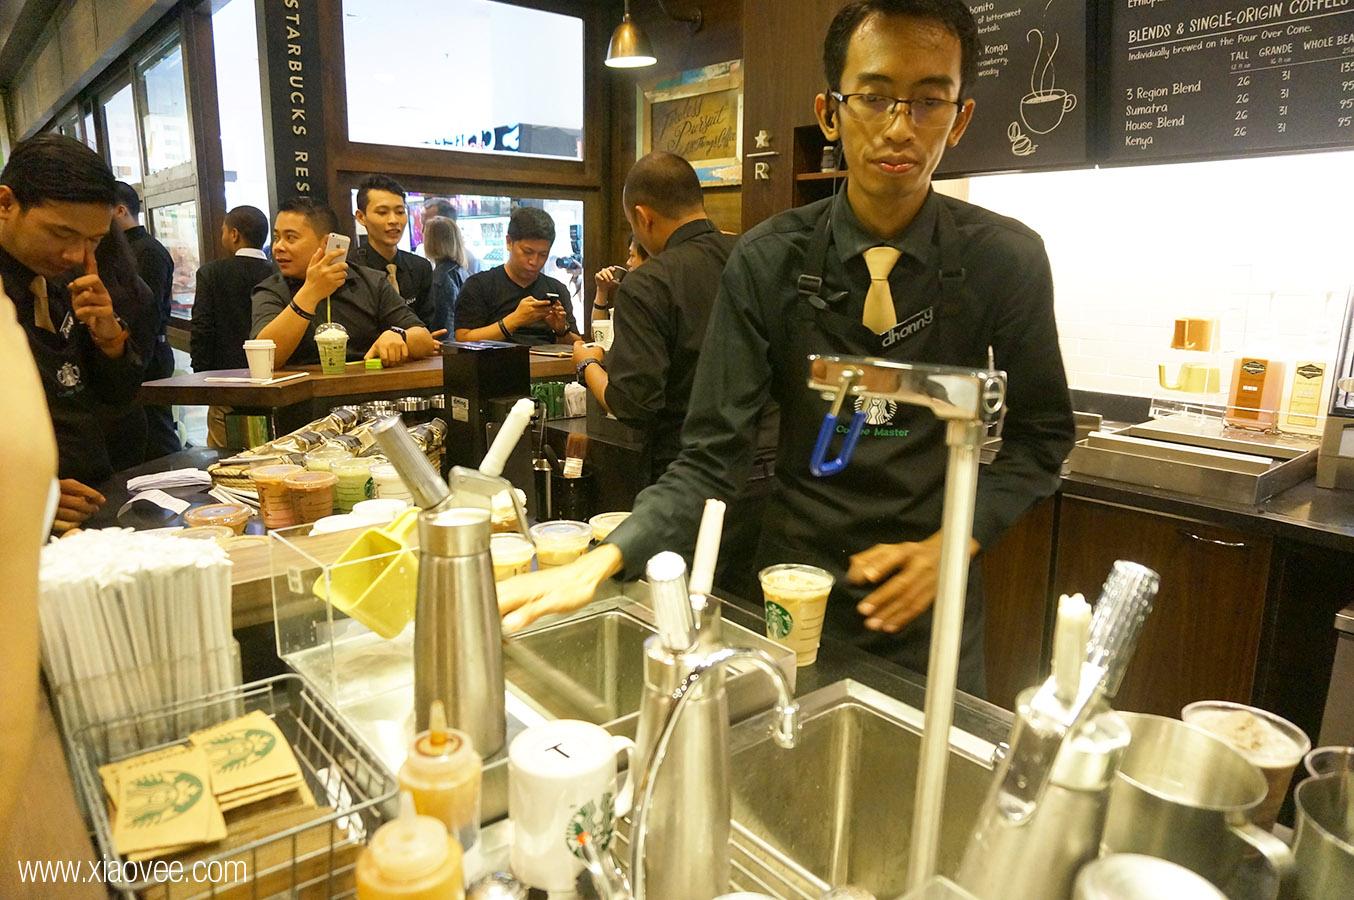 Starbucks Reserve in Surabaya, Starbucks Reserve Galaxy Mall, Starbucks Reserve GM